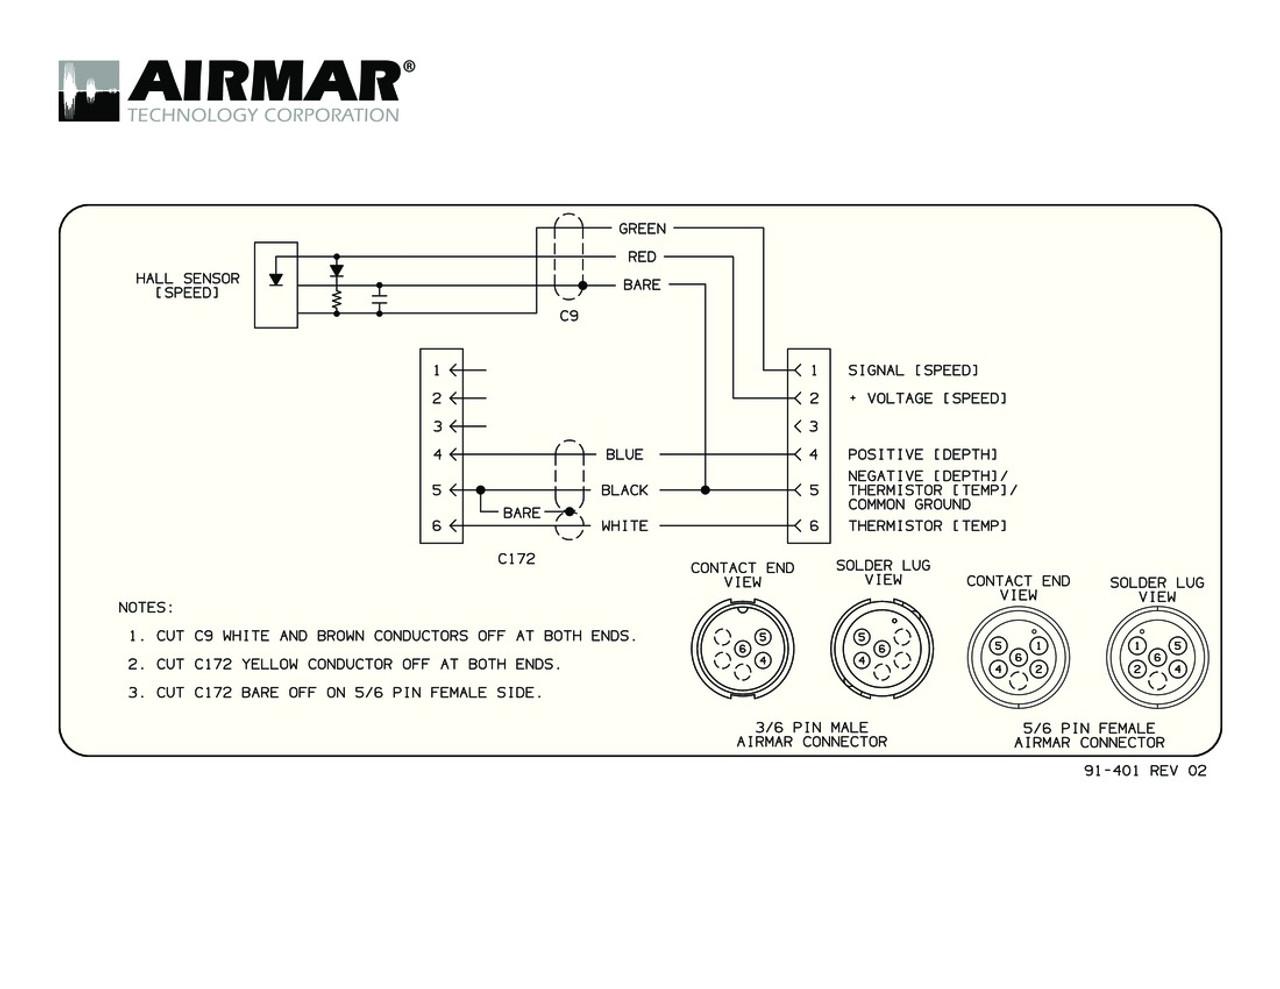 medium resolution of garmin fish finder wiring diagram wiring library garmin fish finder wiring diagram